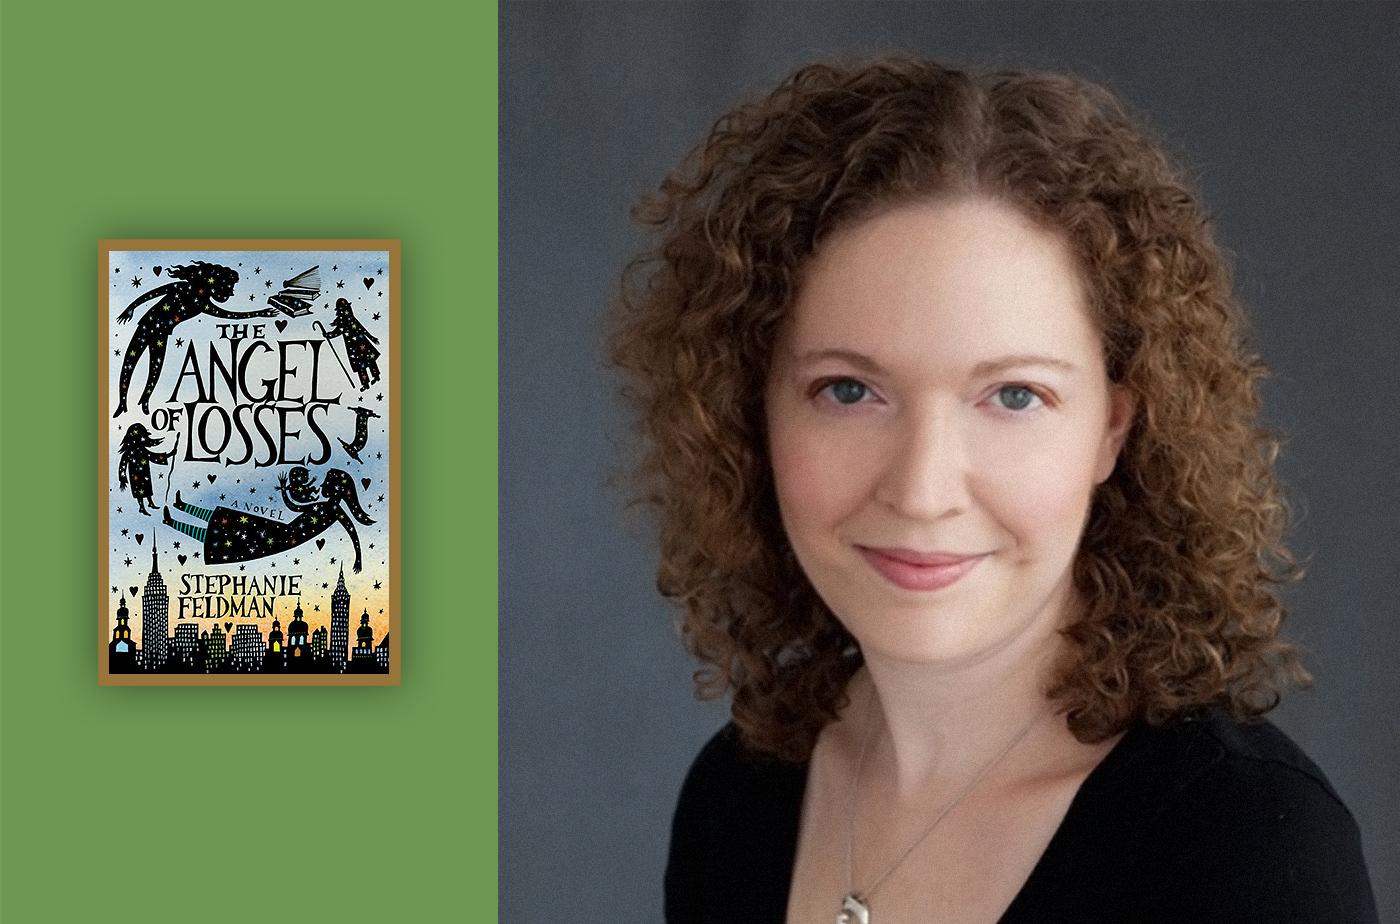 Catapult online classes: Stephanie Feldman, 3-Hour Online Fiction Seminar: Laying the Groundwork for Your Novel, Novel, Fiction, Seminar